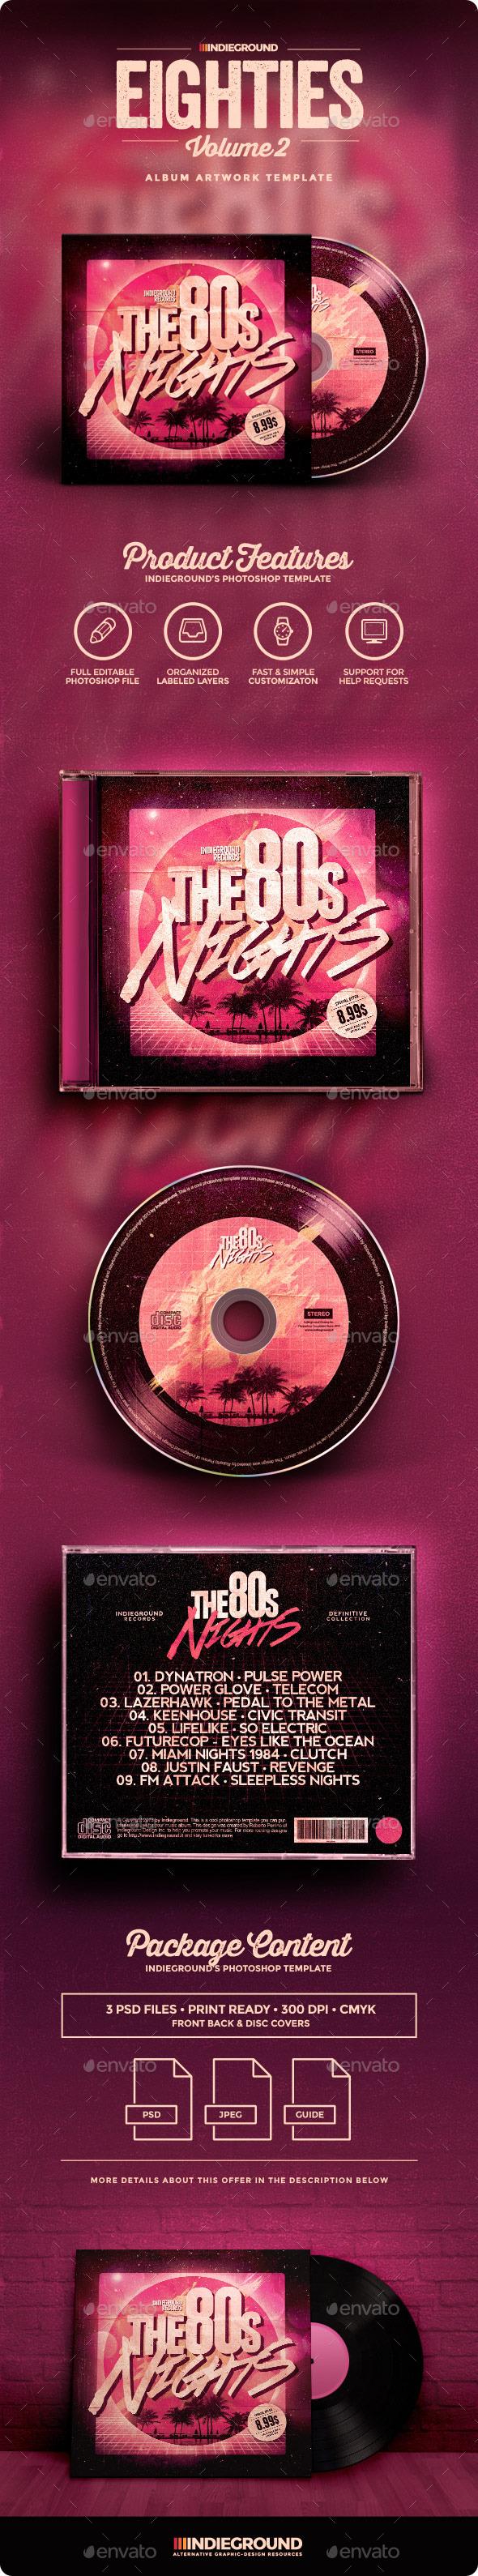 80s CD Album Artwork Vol. 2 - CD & DVD Artwork Print Templates